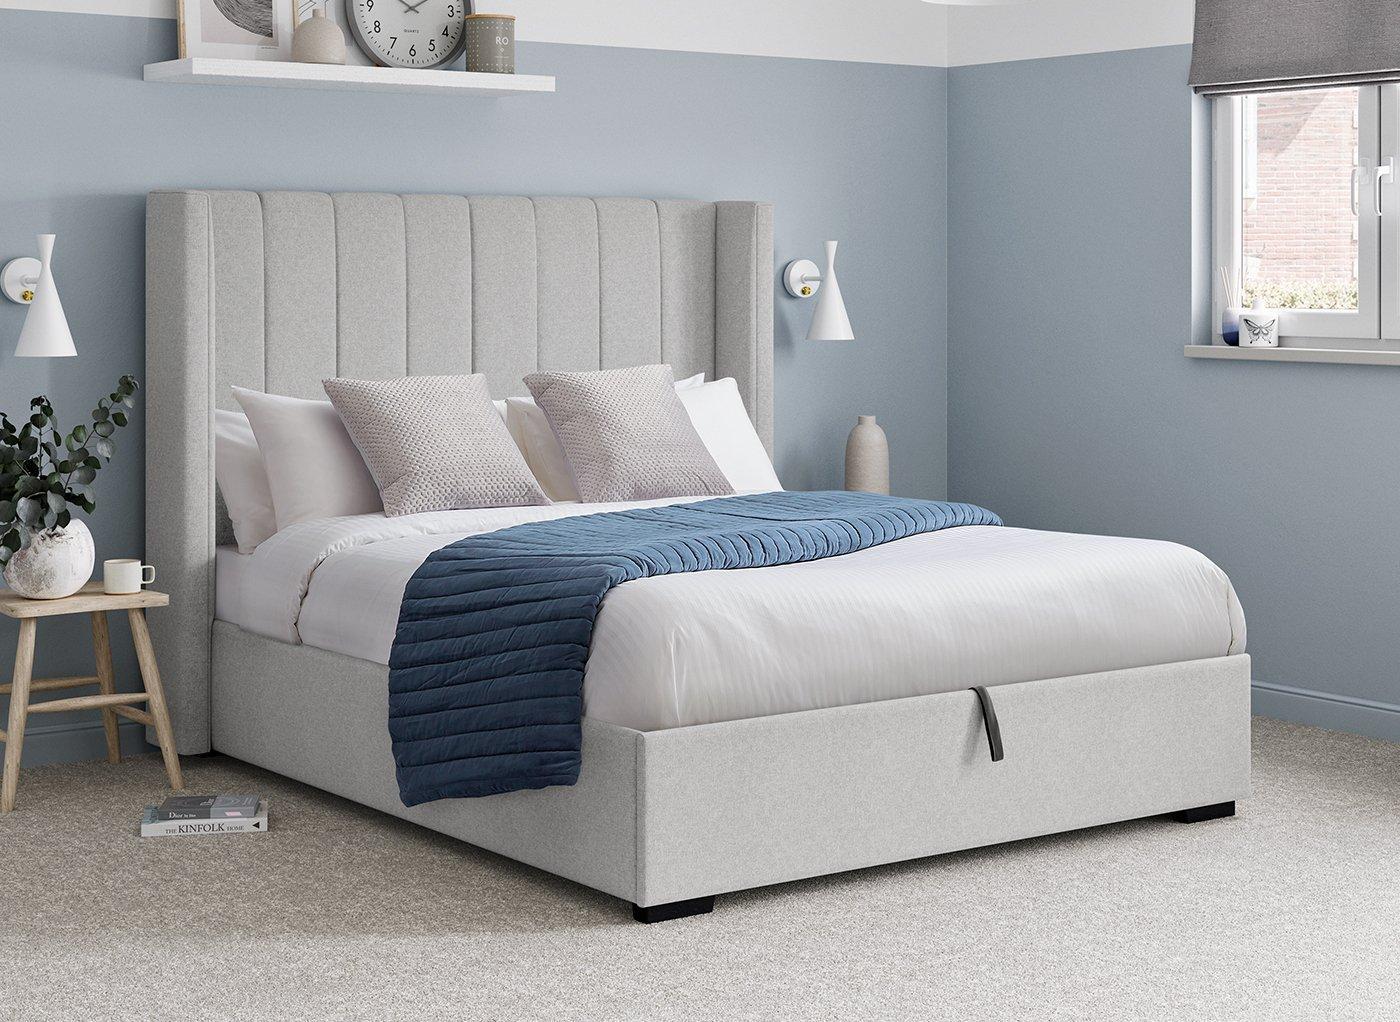 charlie-upholstered-ottoman-bed-frame